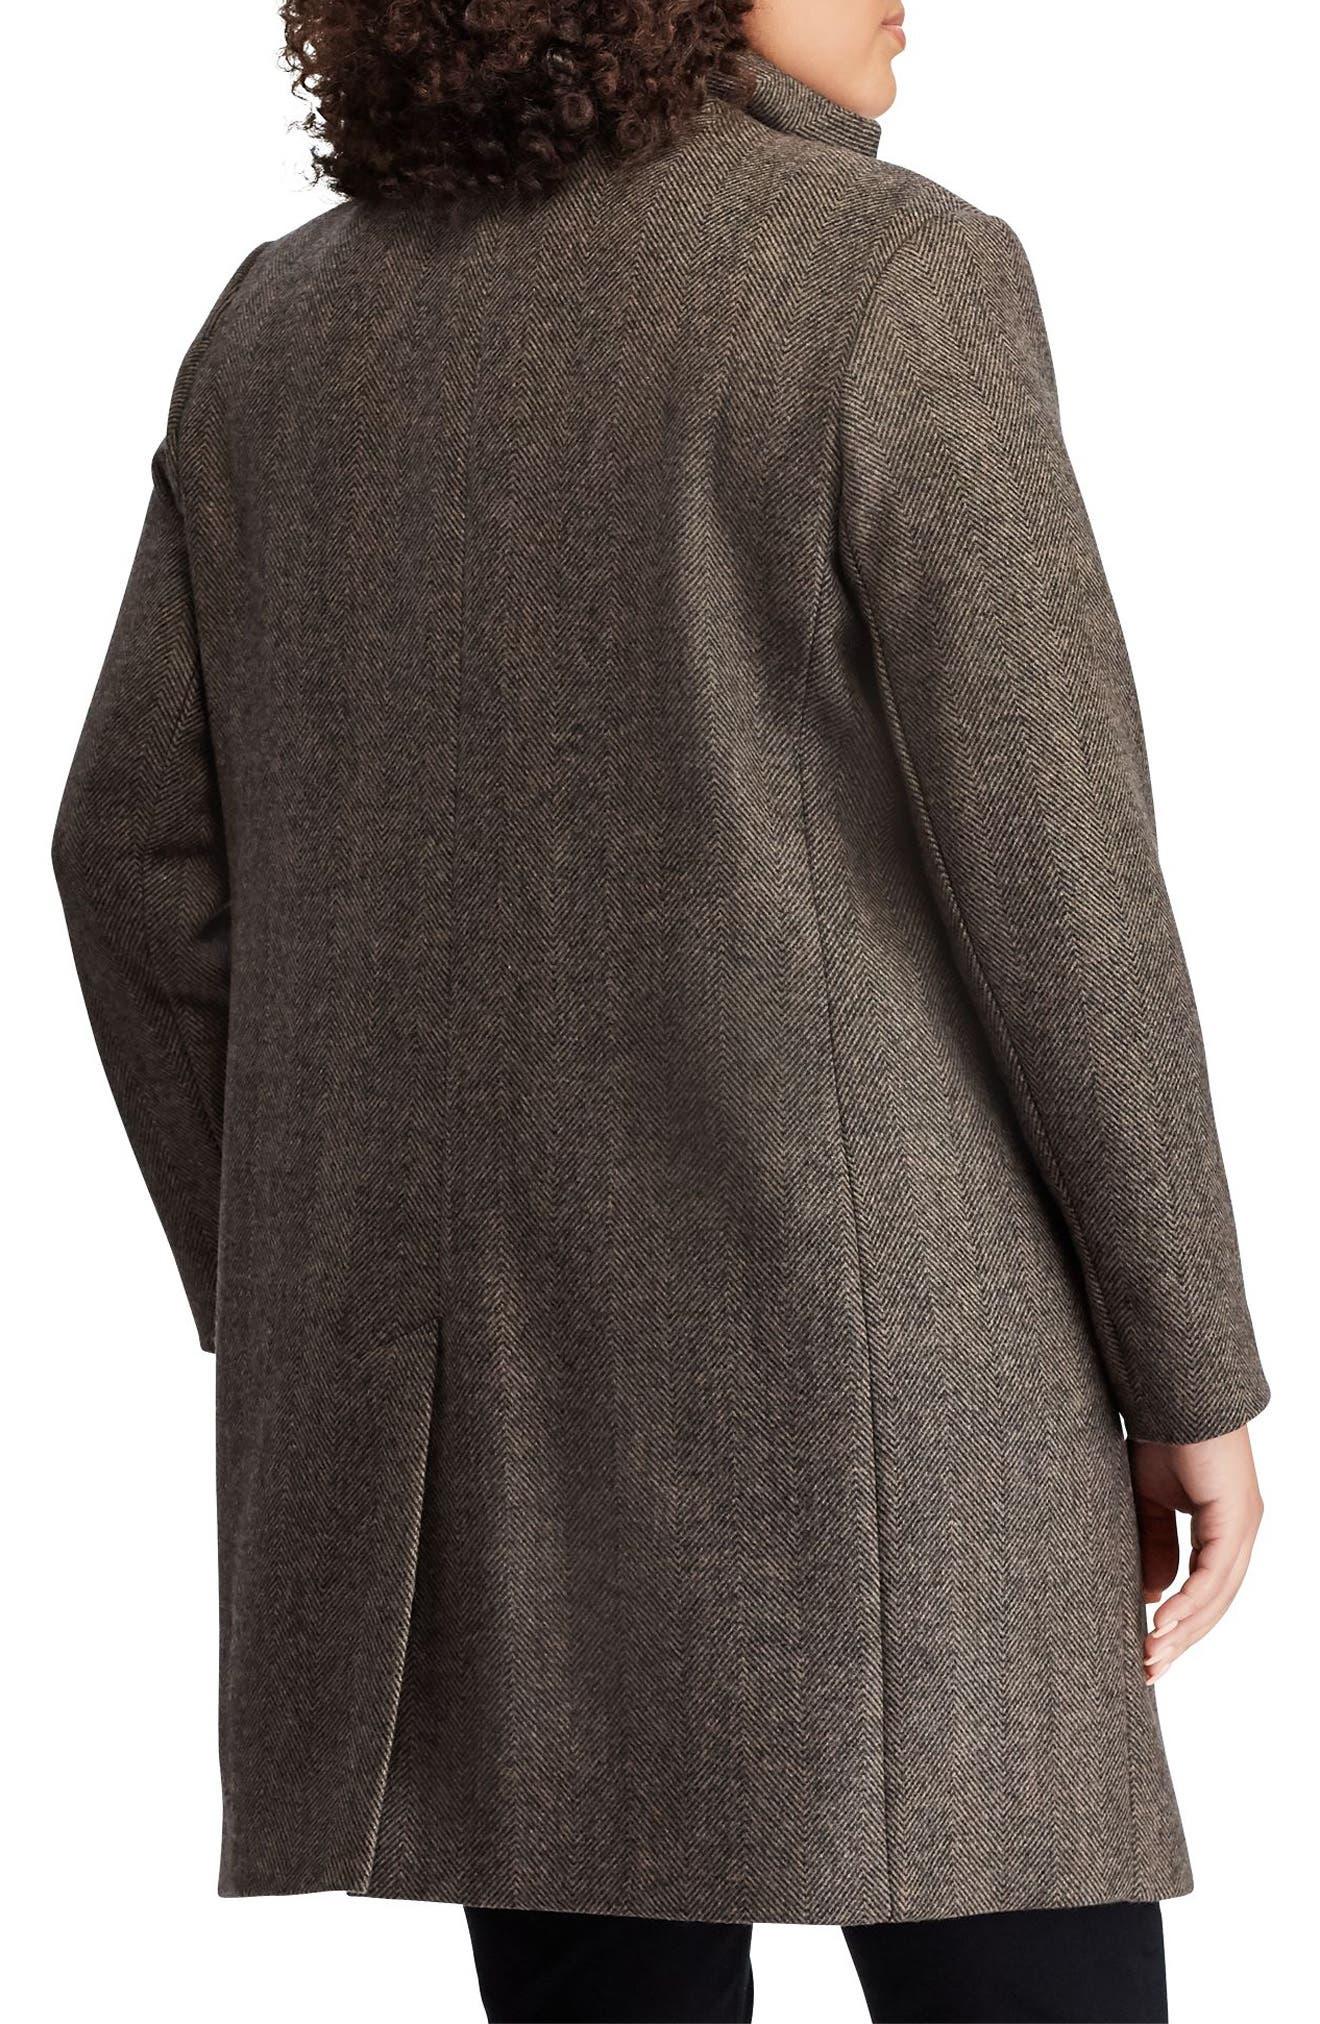 LAUREN RALPH LAUREN,                             Herringbone Wool Blend Reefer Coat,                             Alternate thumbnail 2, color,                             008